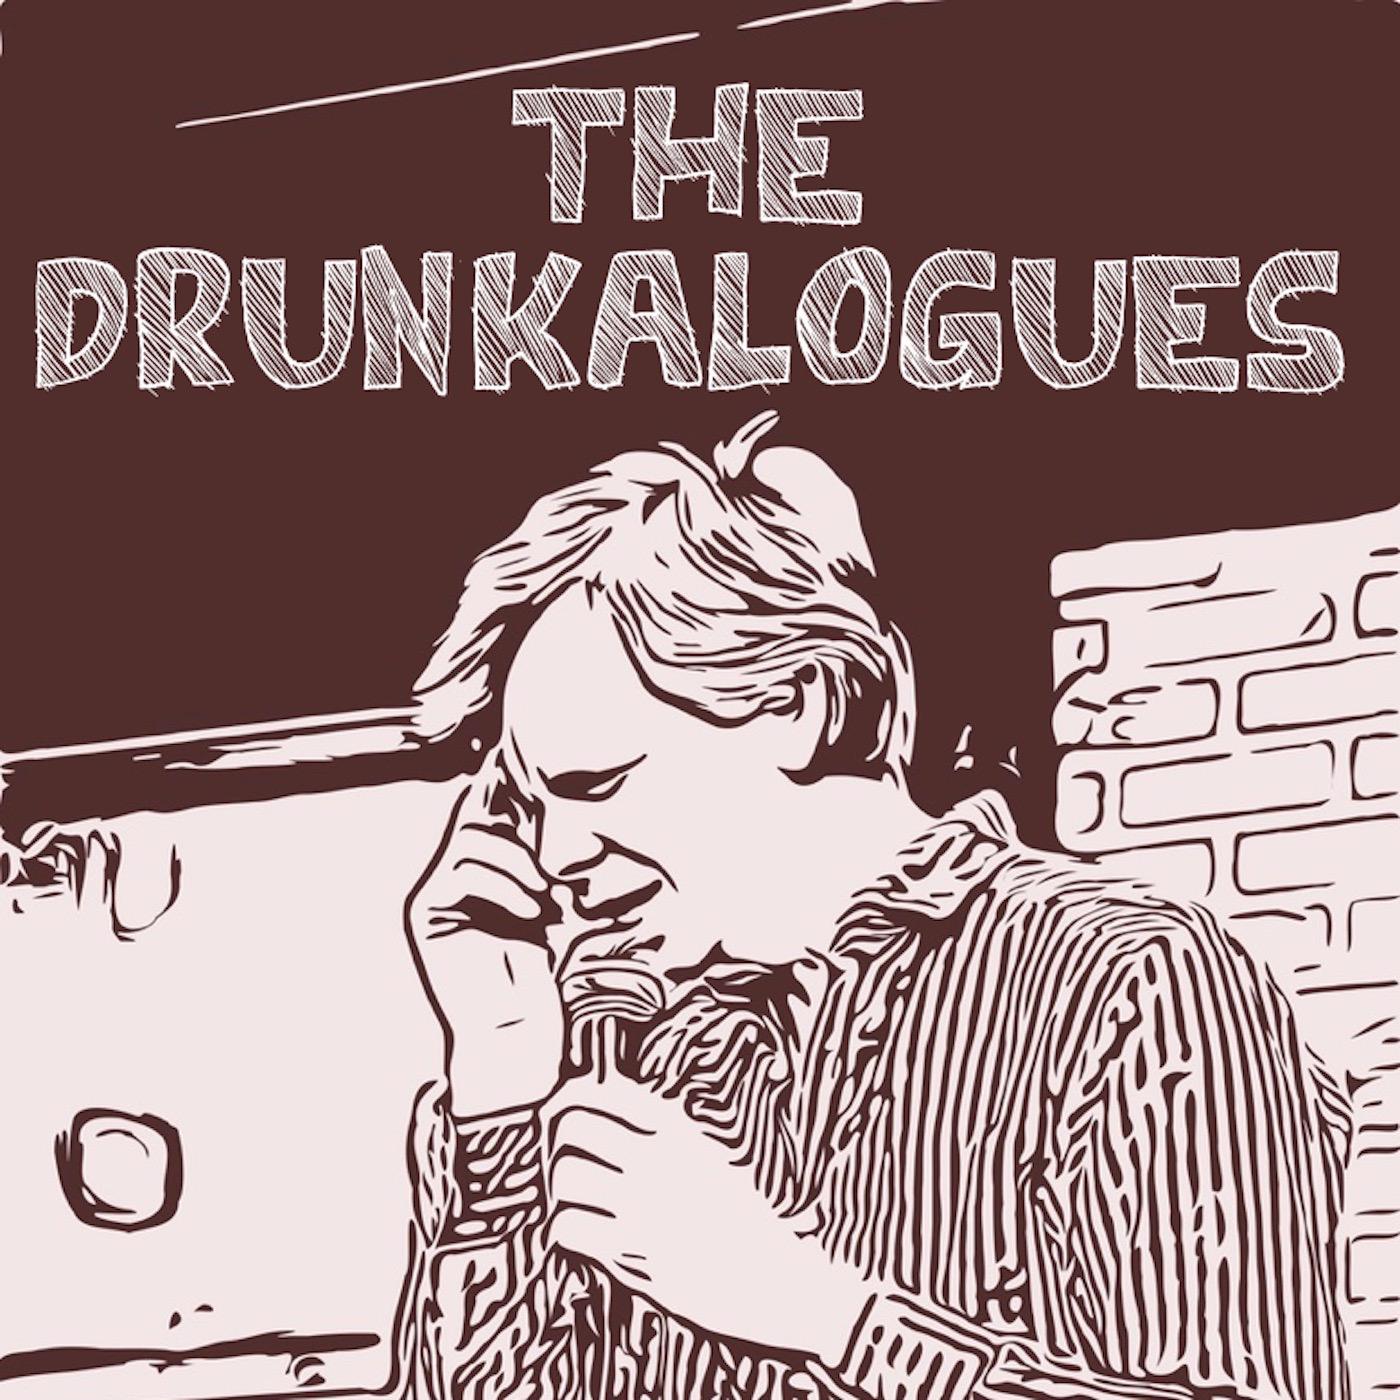 The Drunkalogues show art